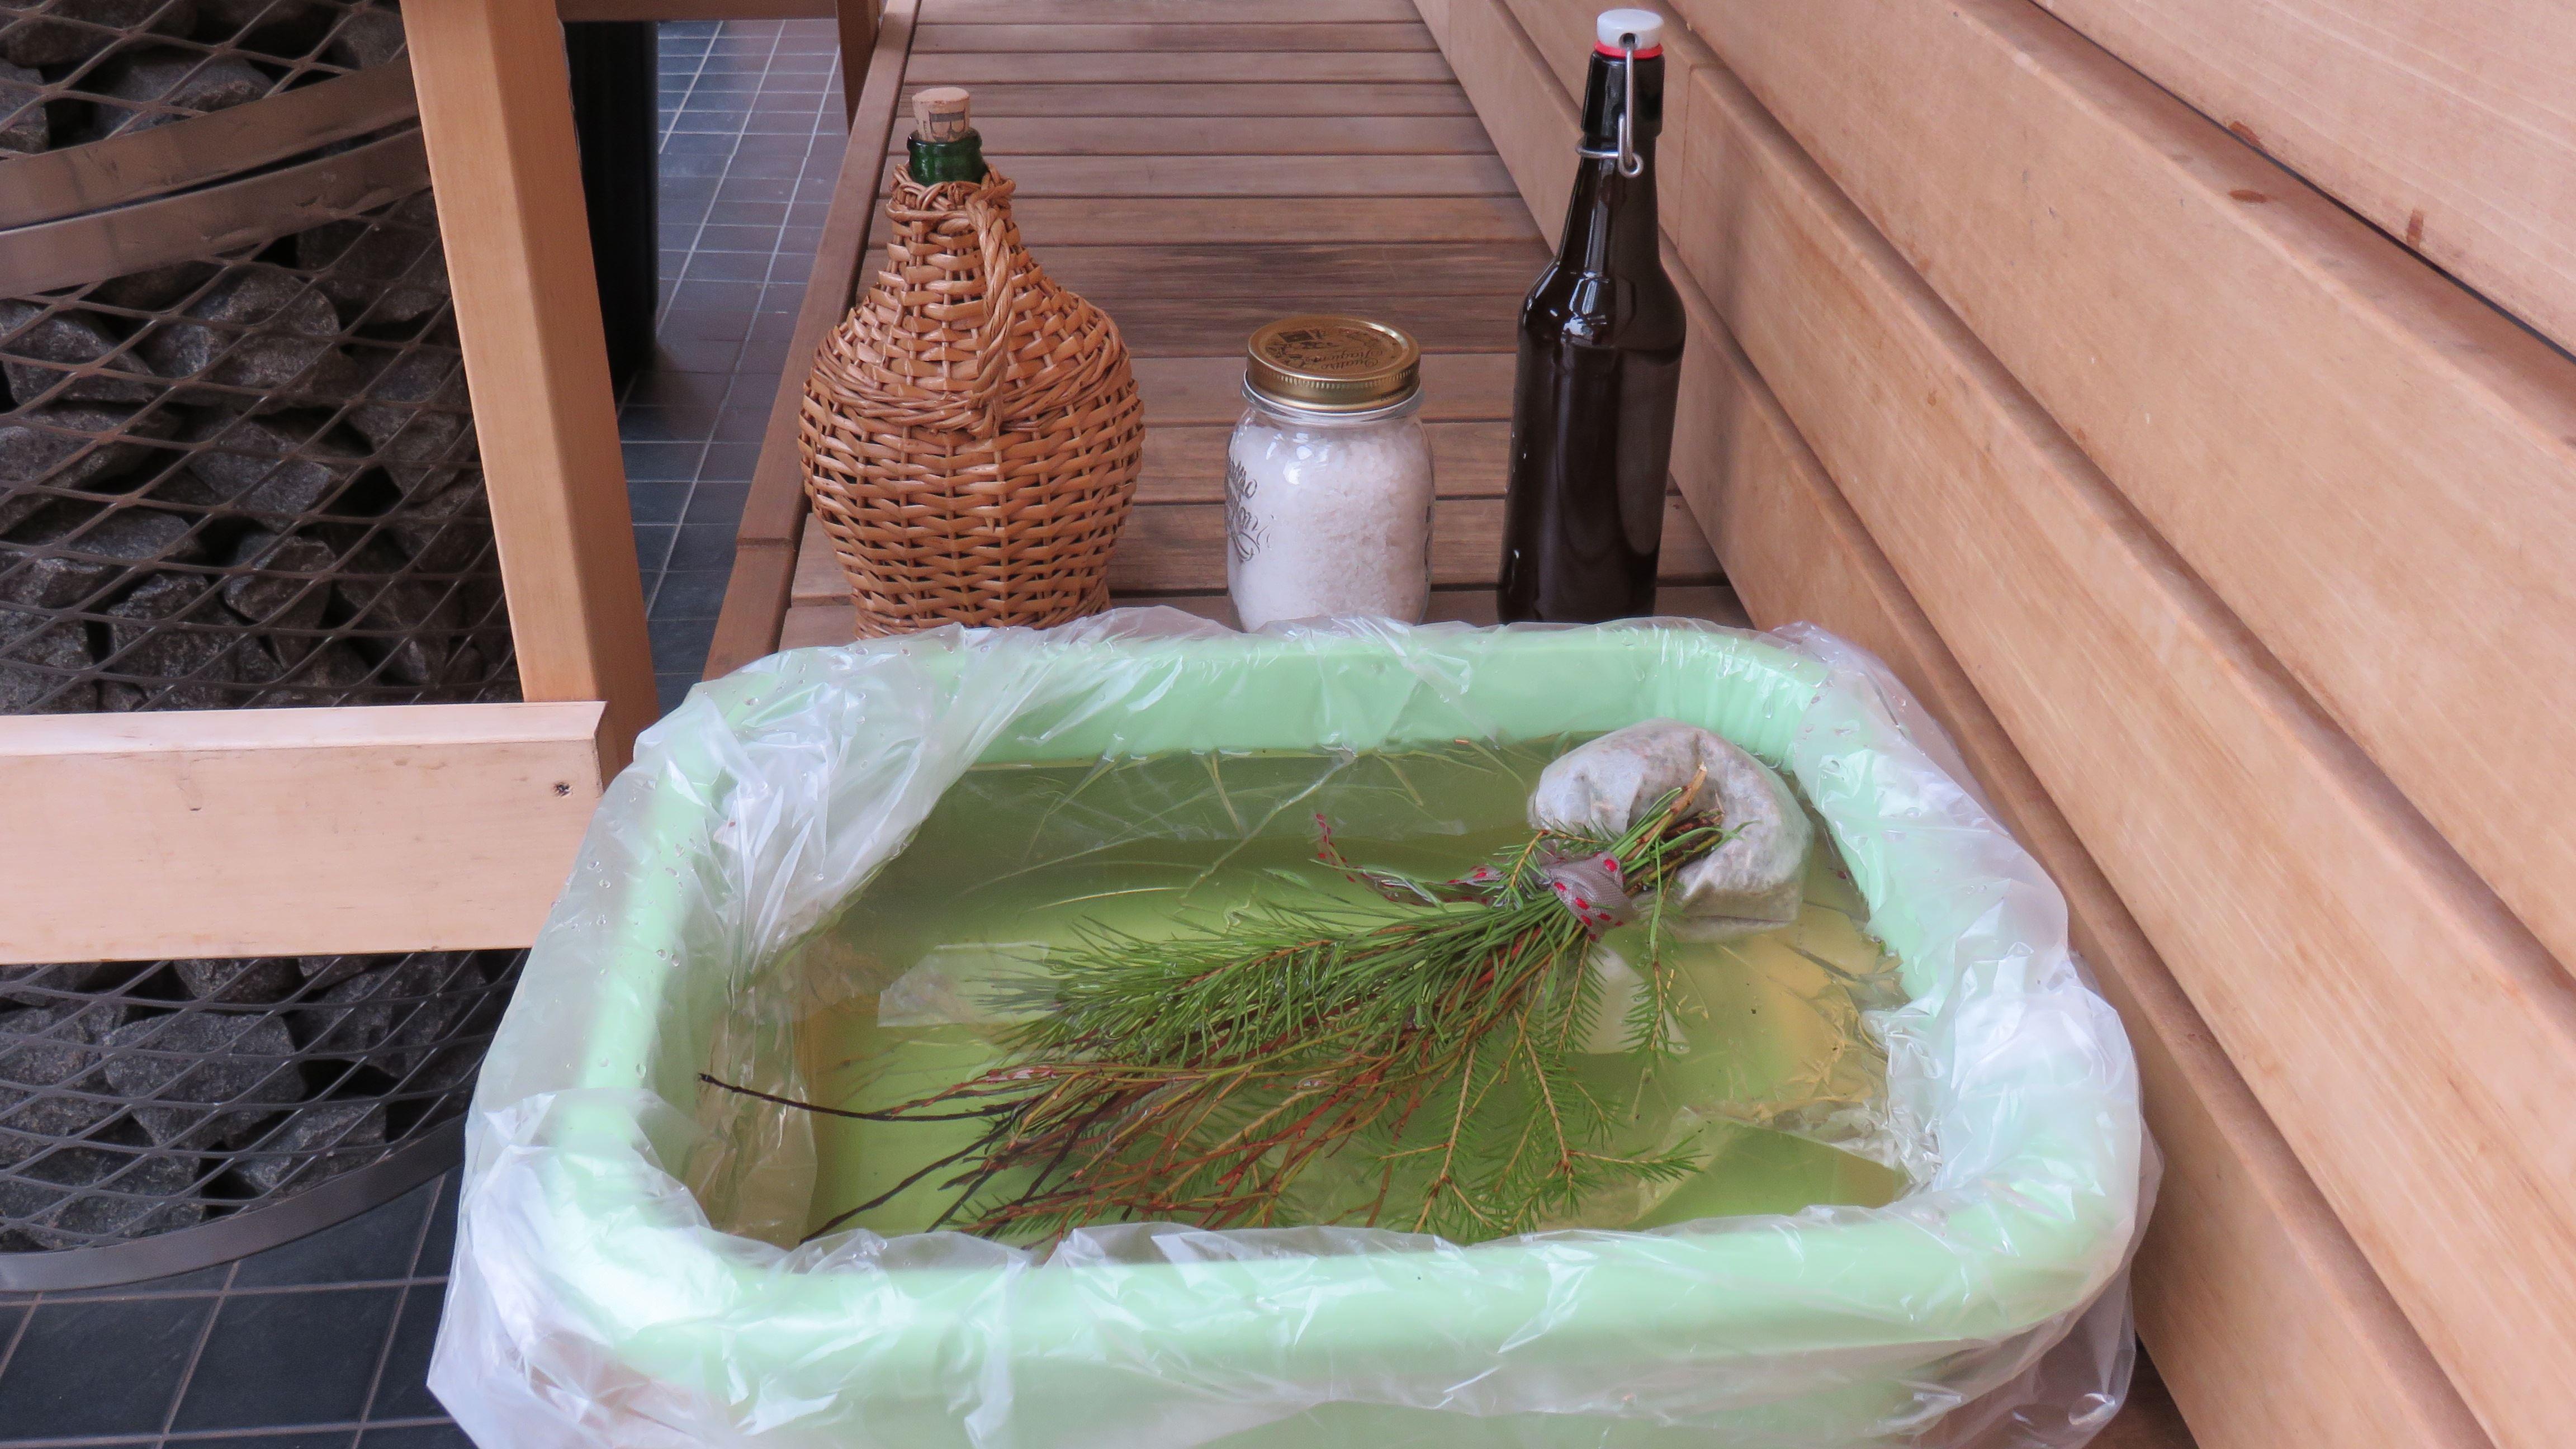 Vellamo's herbal sauna experience